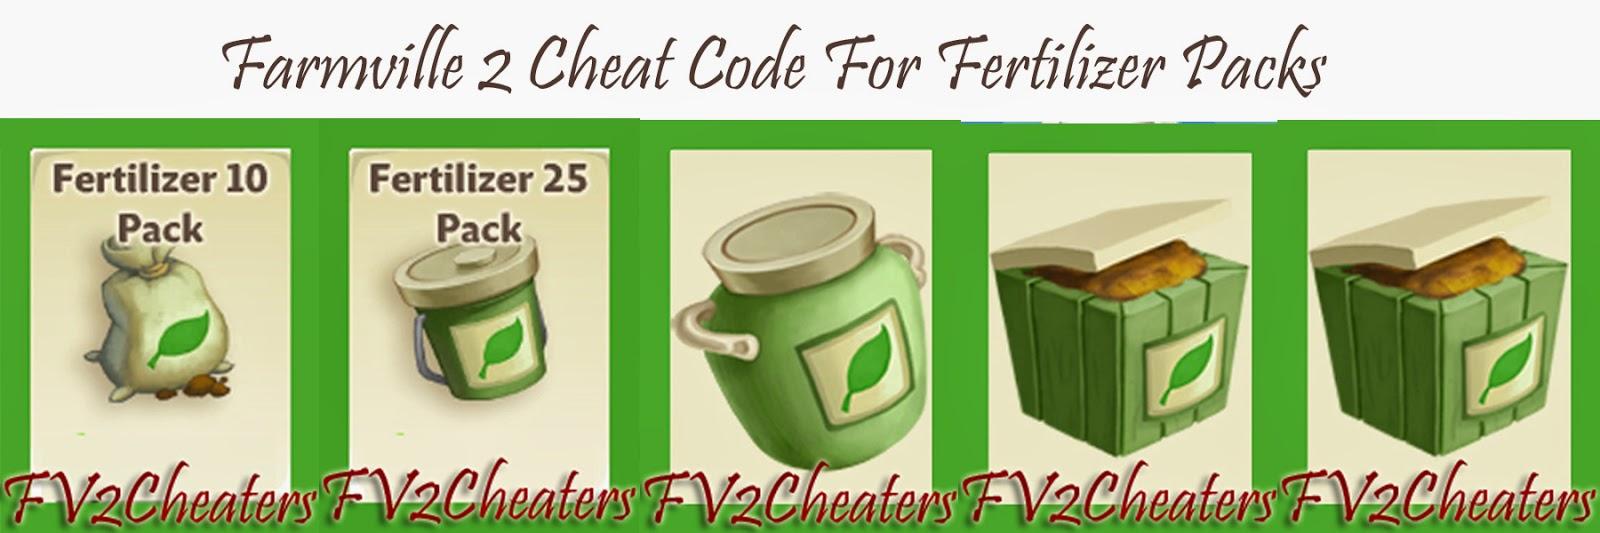 Fertilizer Pack <b>FarmVille 2 Cheat Codes</b> - <b>Farmville 2 Cheat</b> Gallery